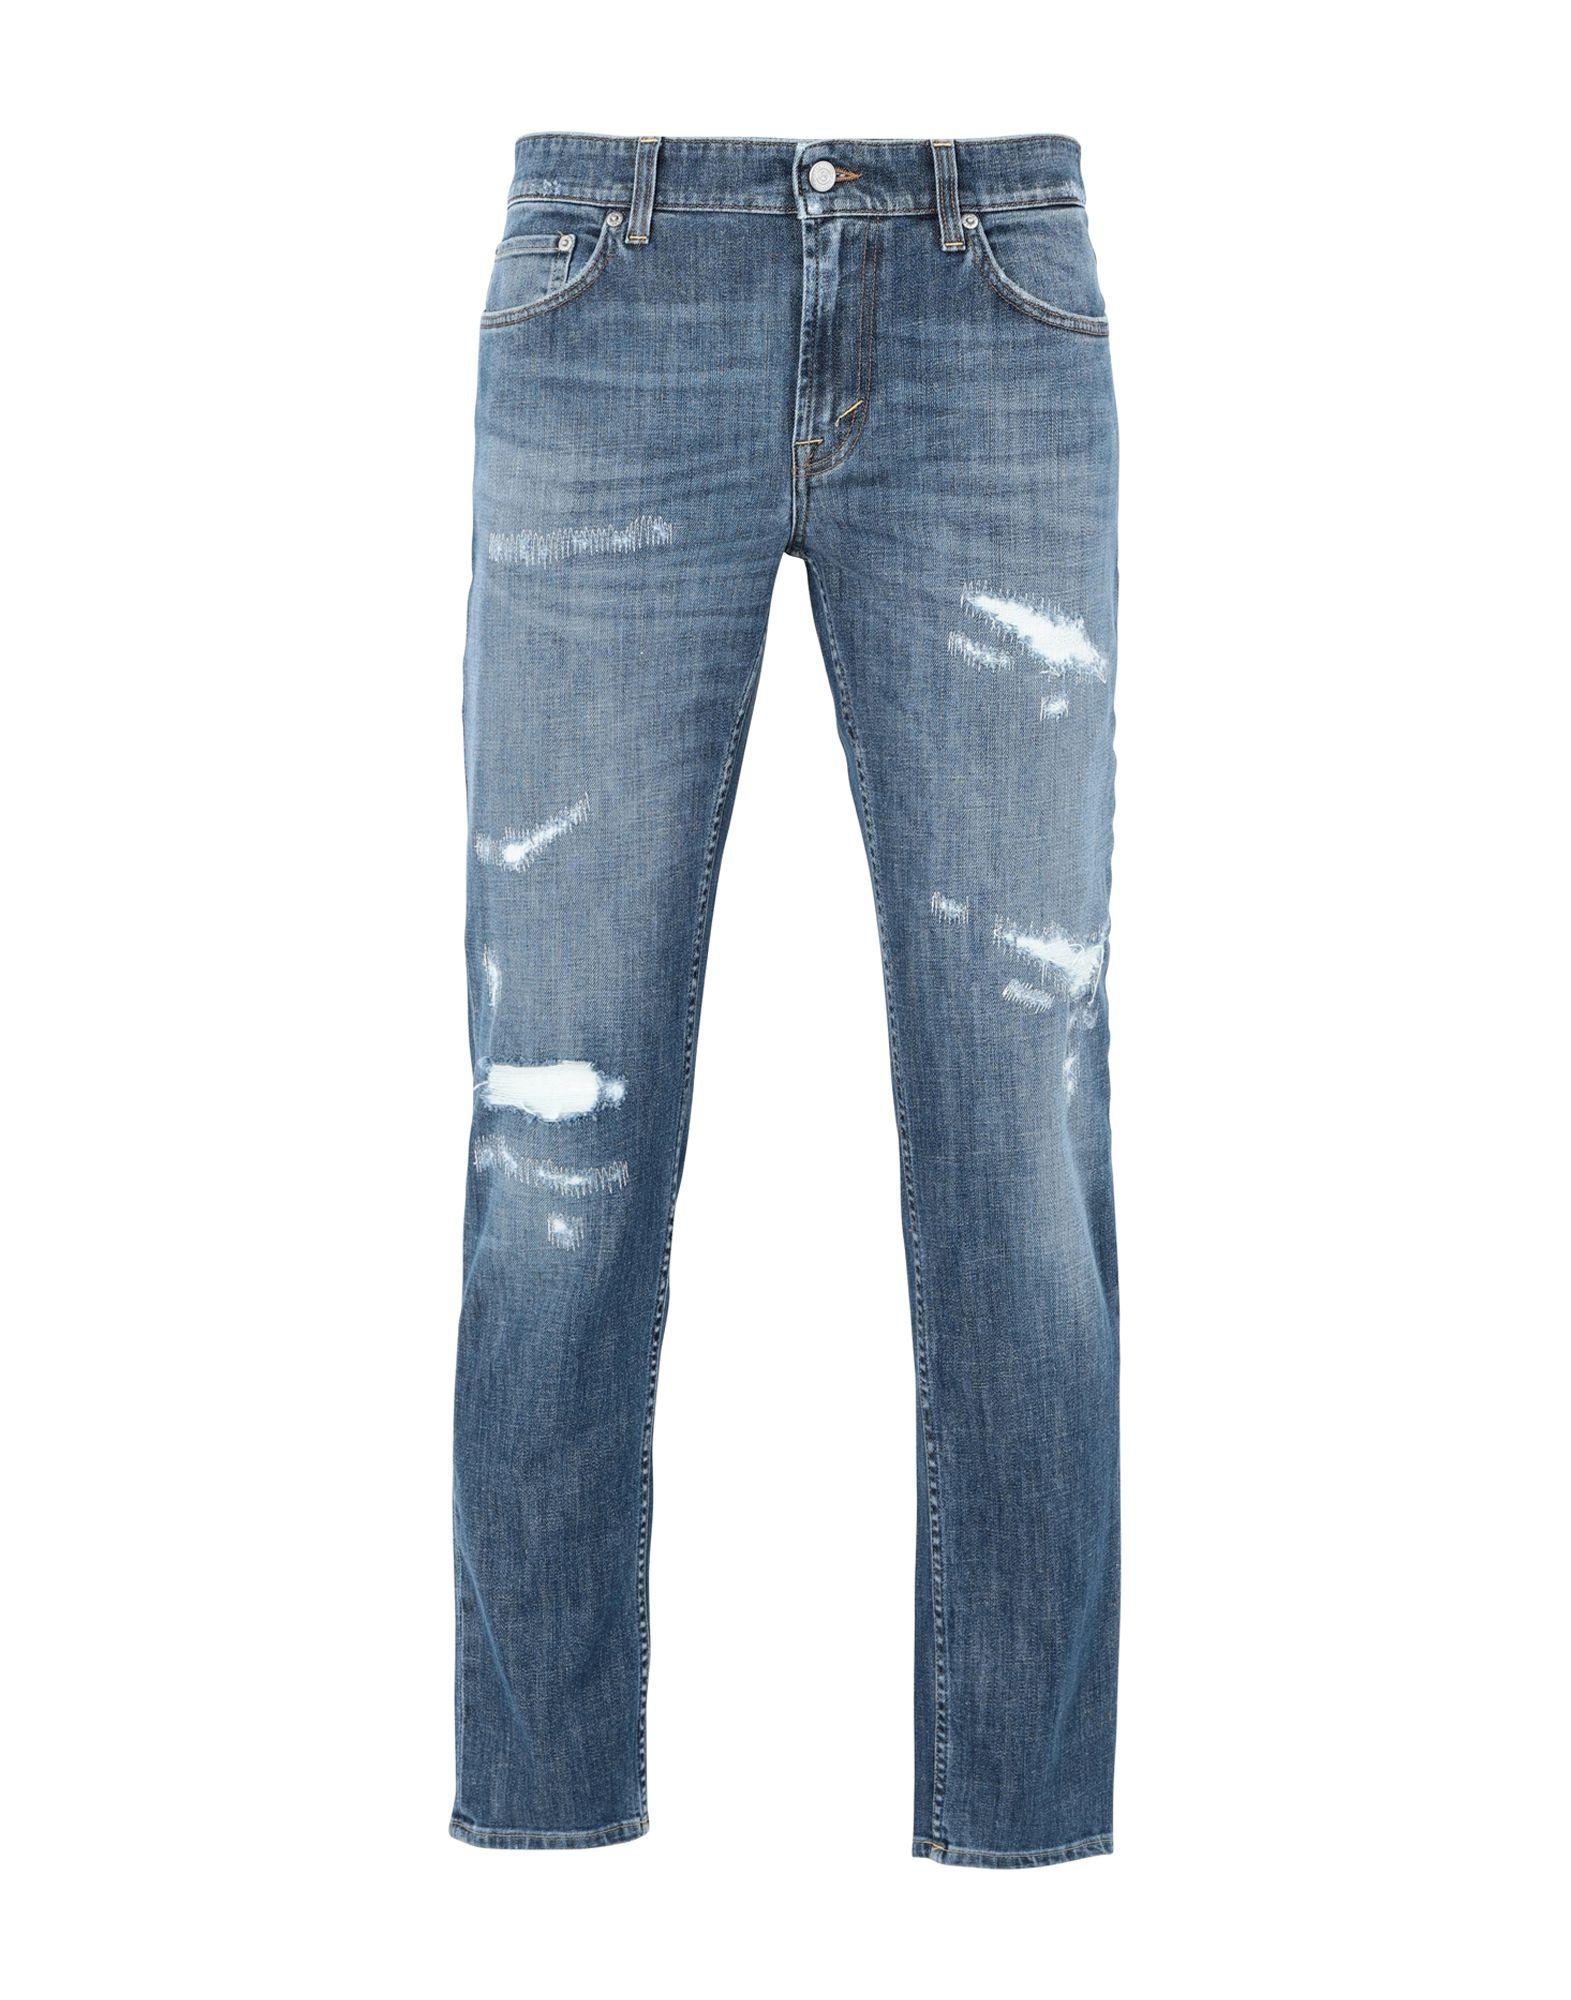 Pantaloni Jeans Jeans Department 5 Pantalone Skeith - uomo - 42732095CL